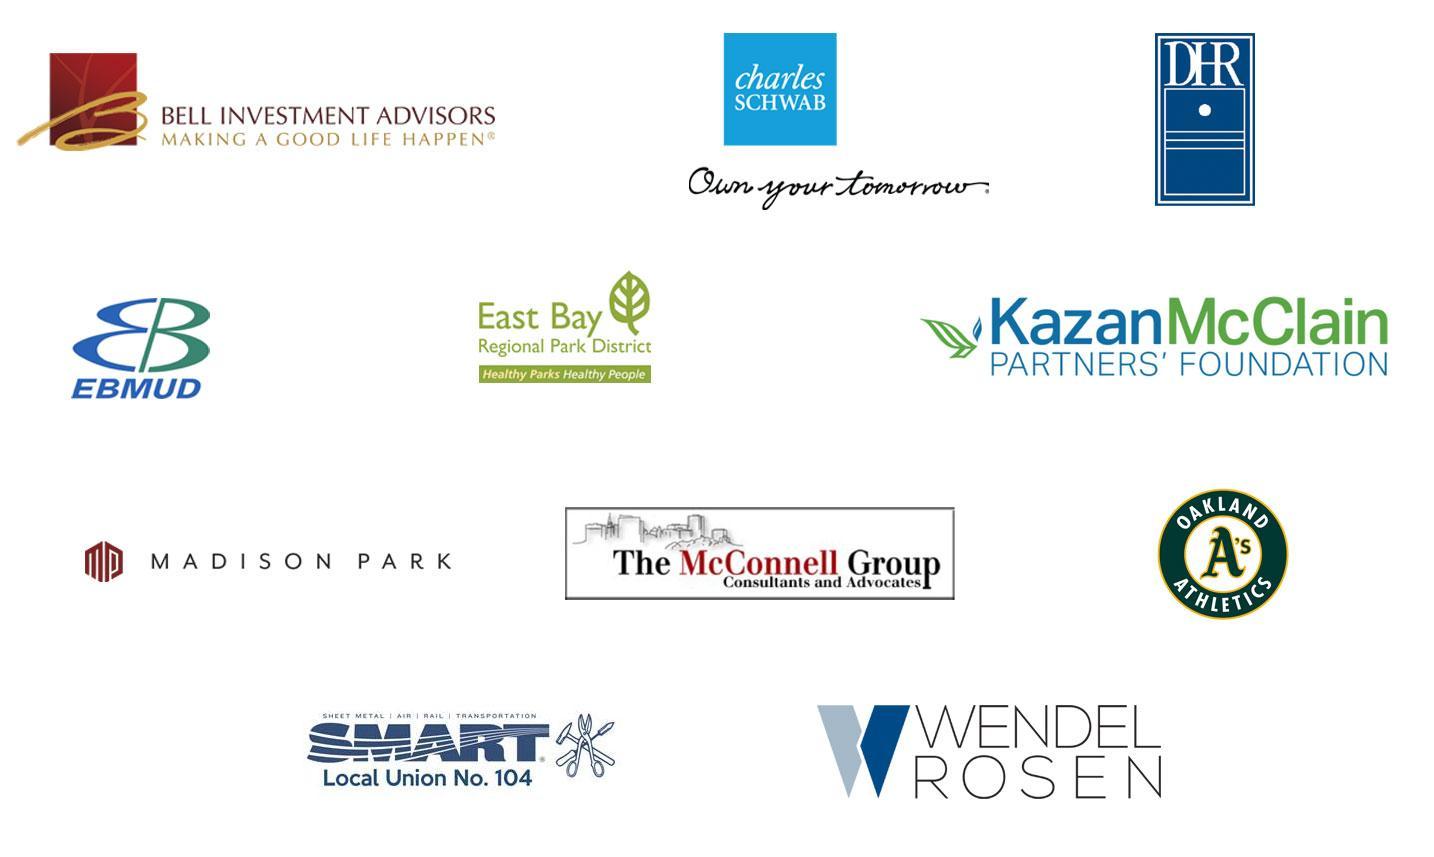 Sponsors - Logos